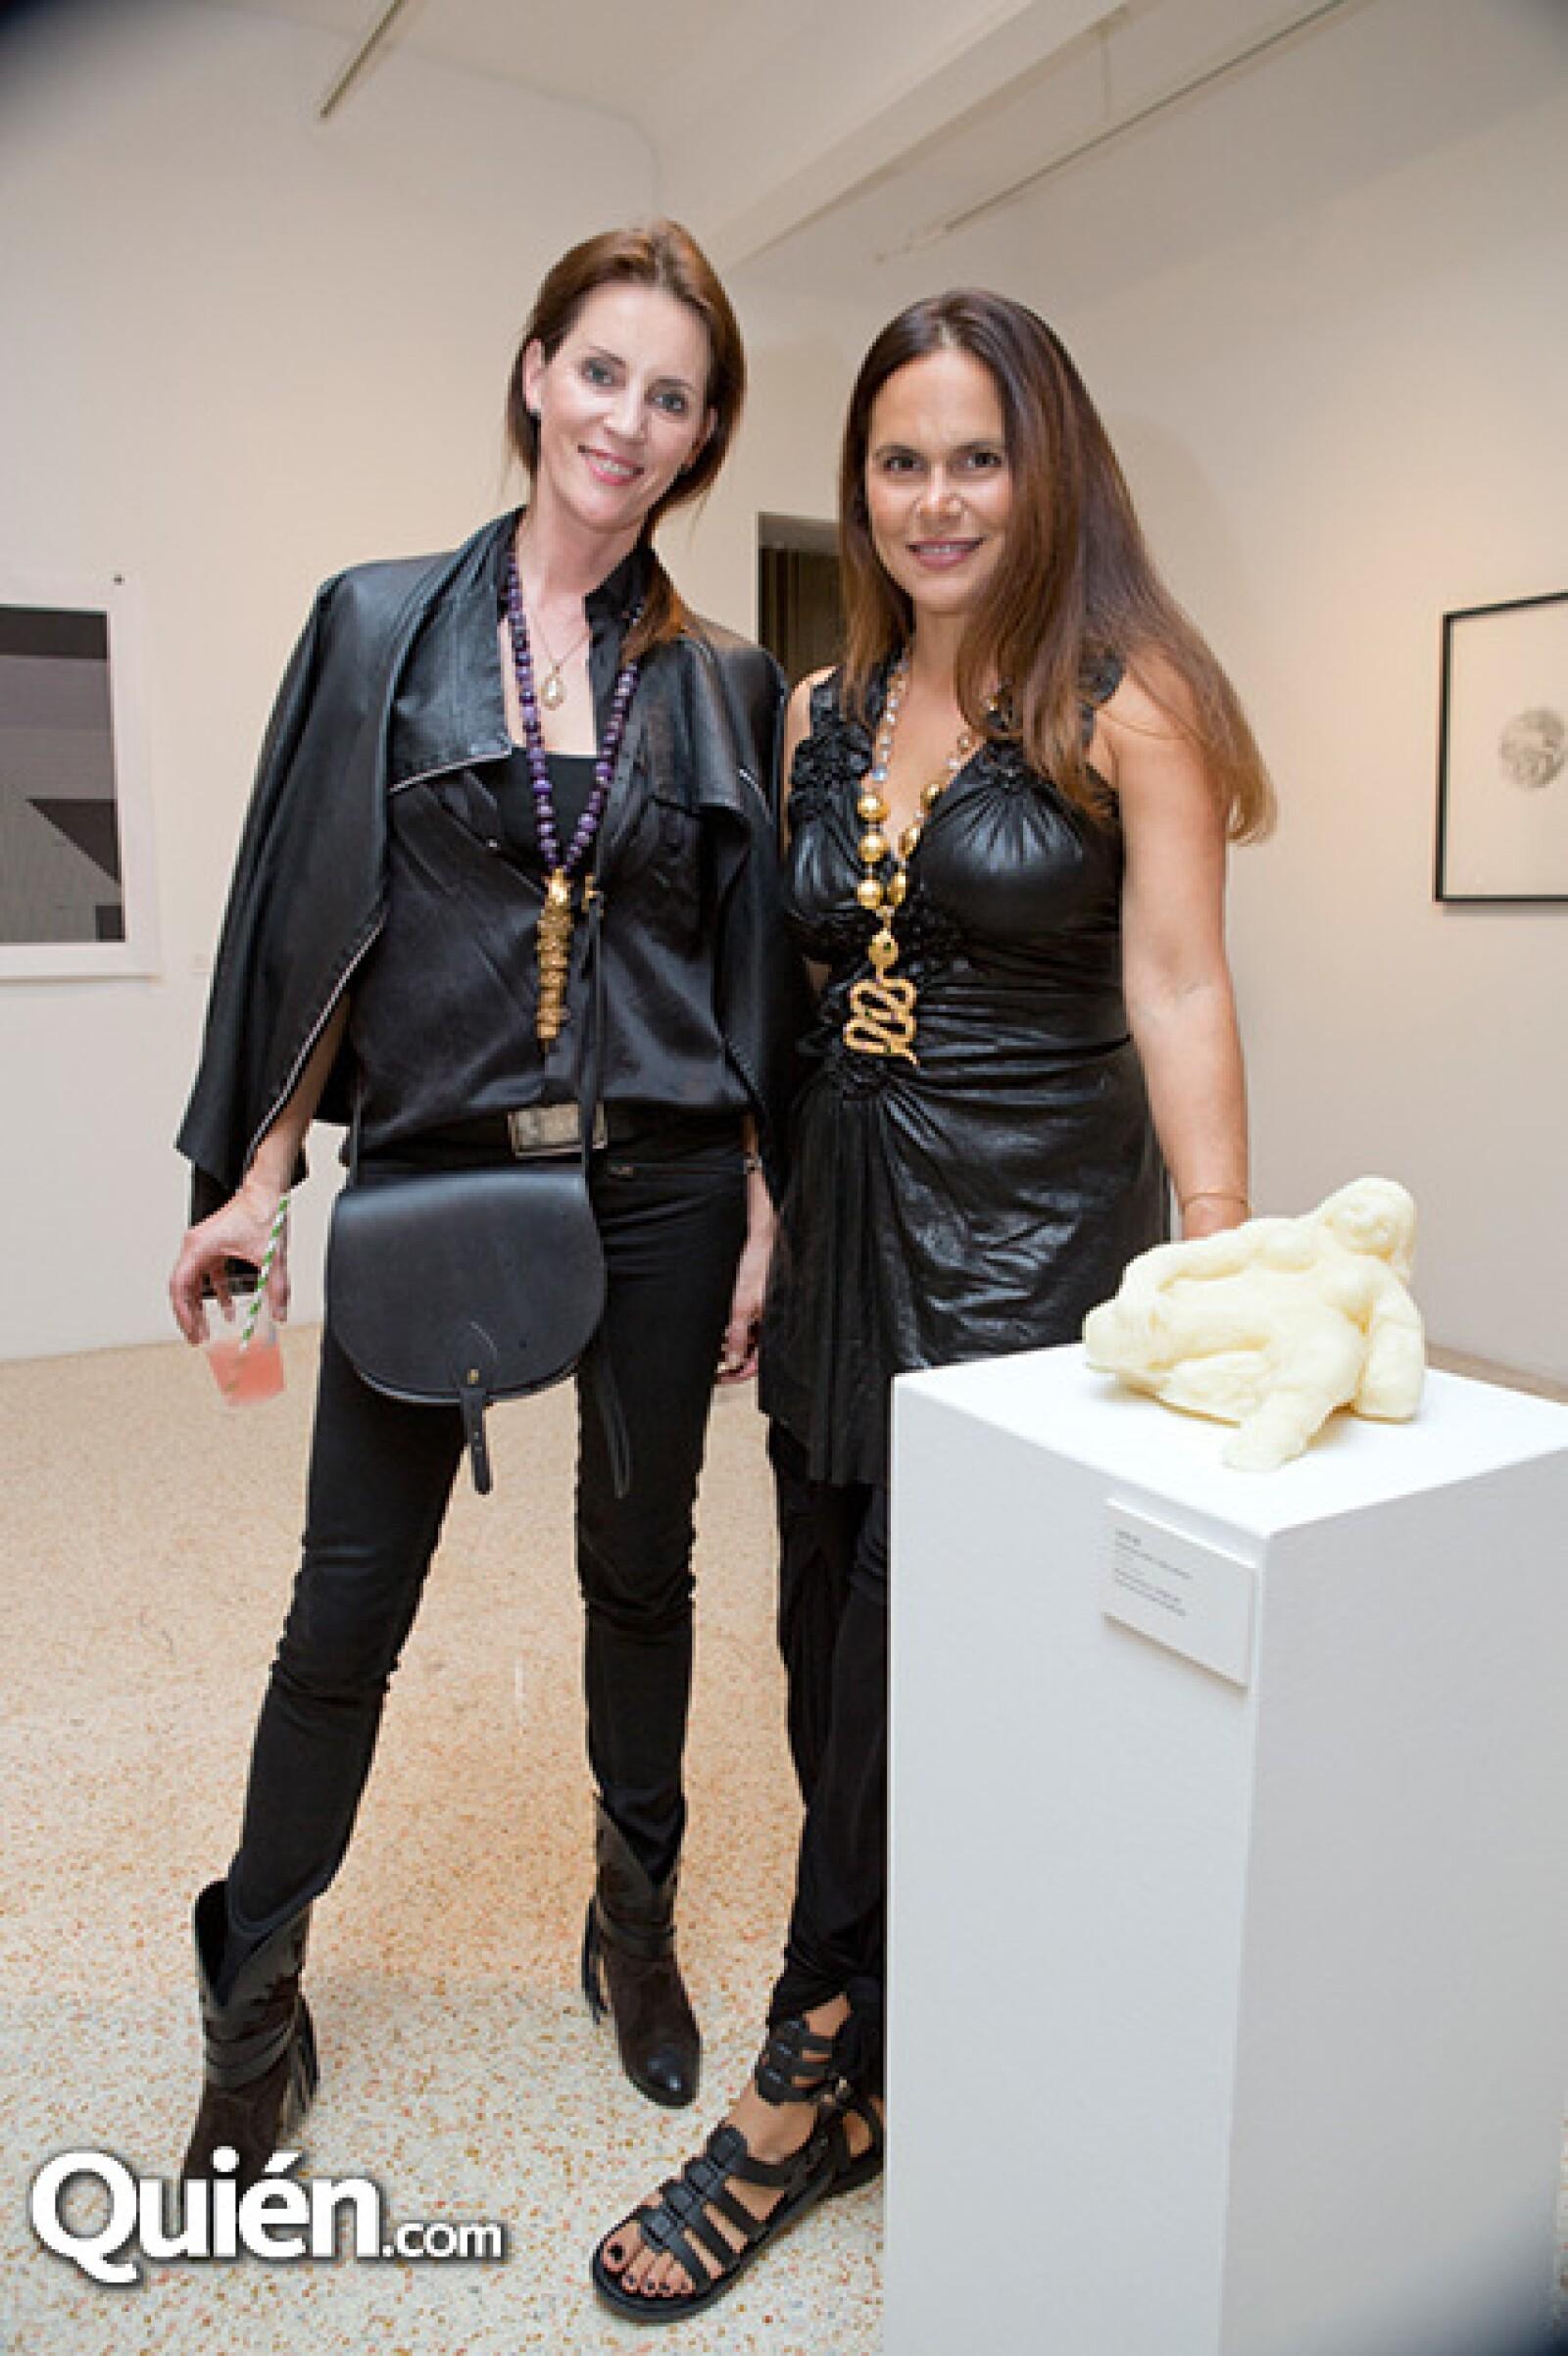 Piret Johanson y Sandra Chartouni